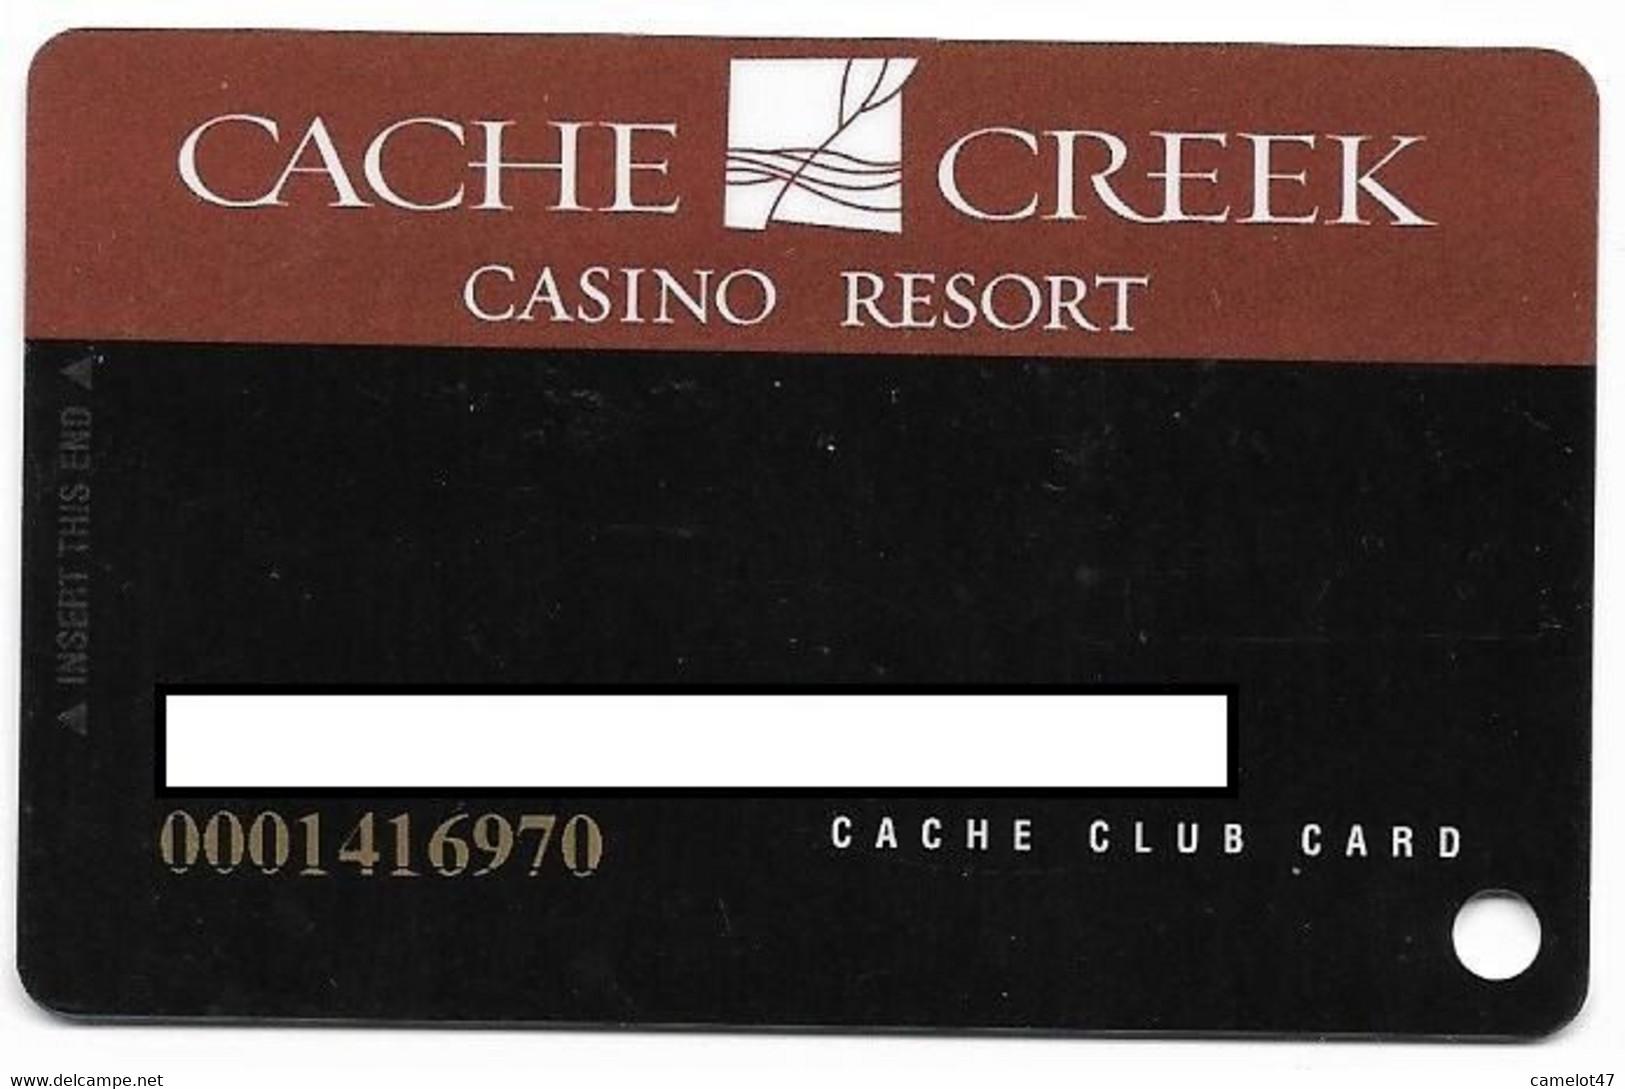 Cache Creek Casino, Brooks, CA, U.S.A., Older Used Slot Or Player's Card, # Cachecreek-2 - Casino Cards